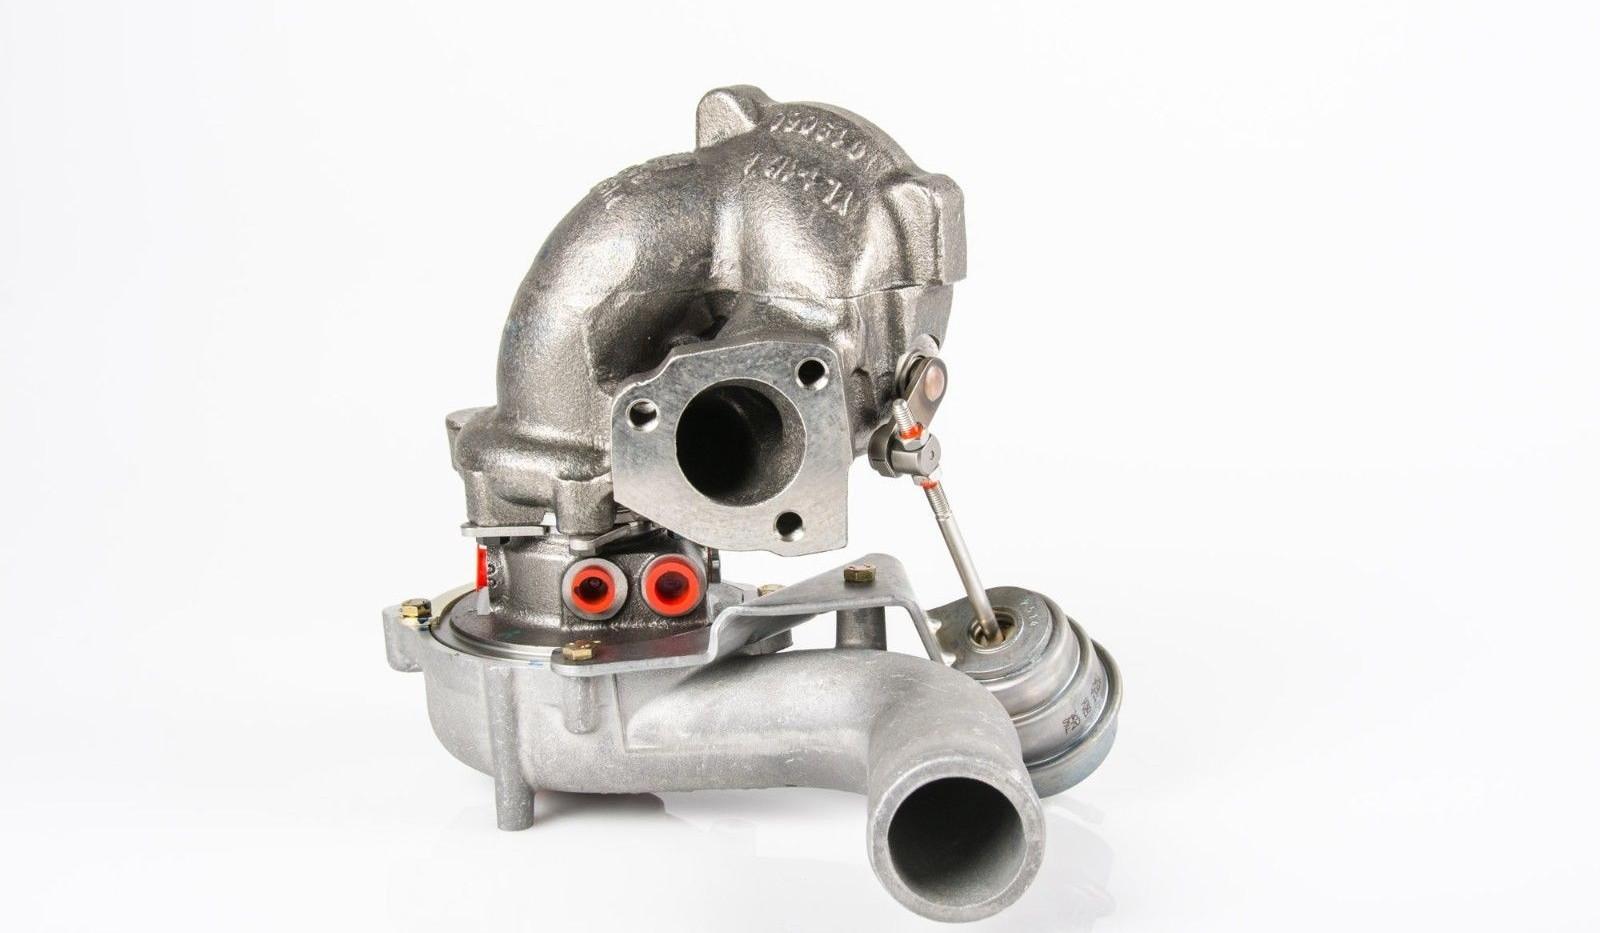 KKK Borgwarner K04-001 Performance turbo 240hp VAG 1.8T 20VT